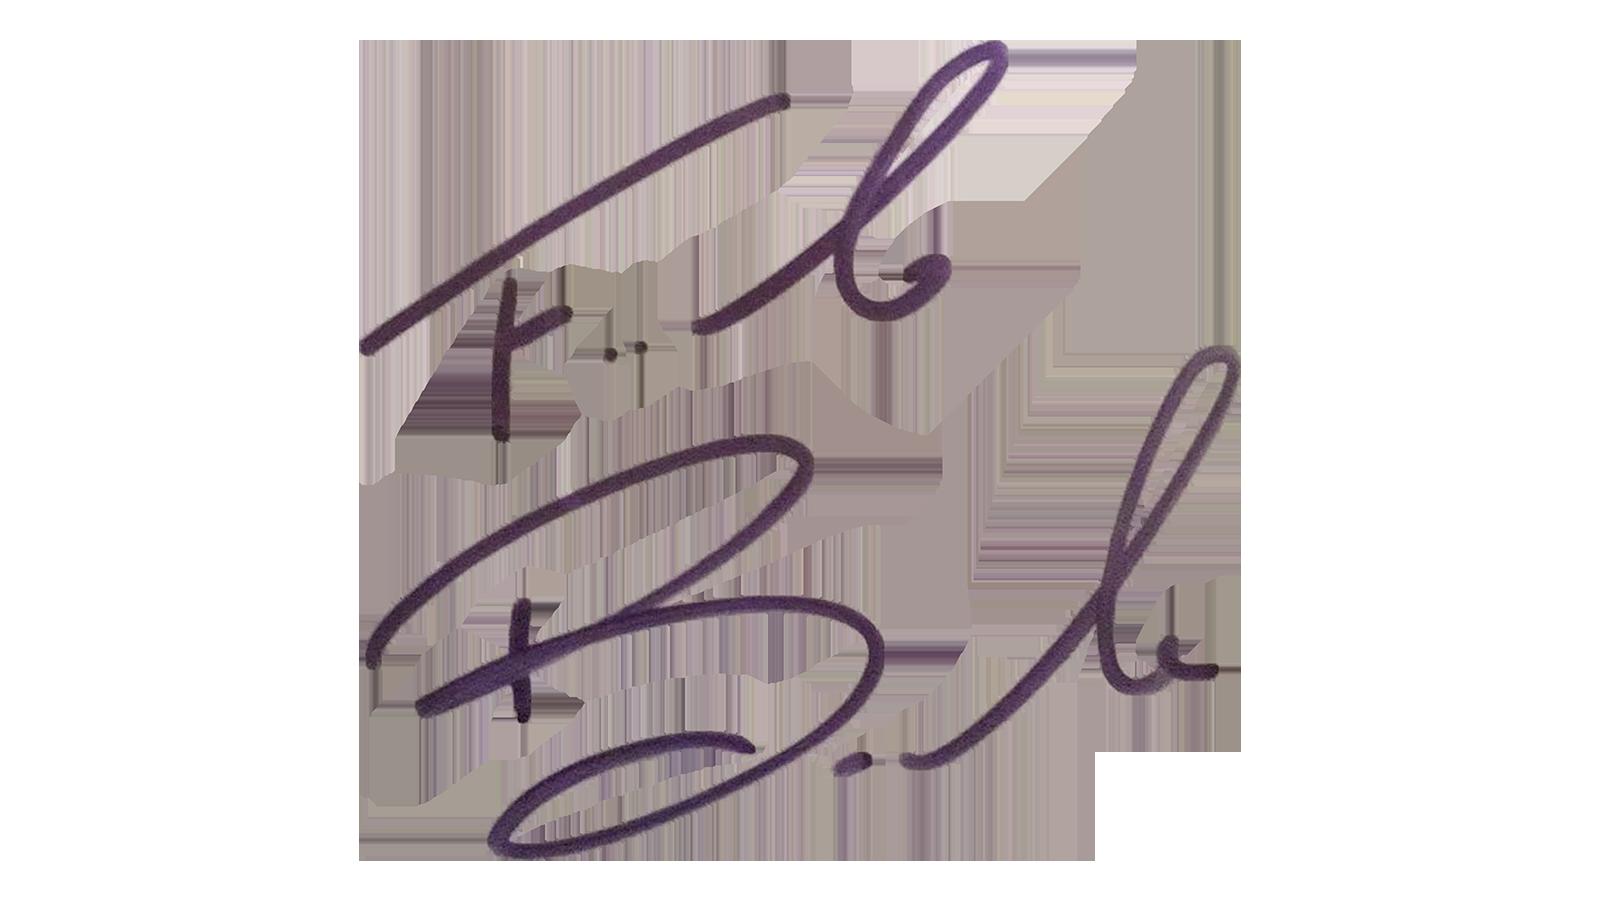 La firma di Fabio Basile